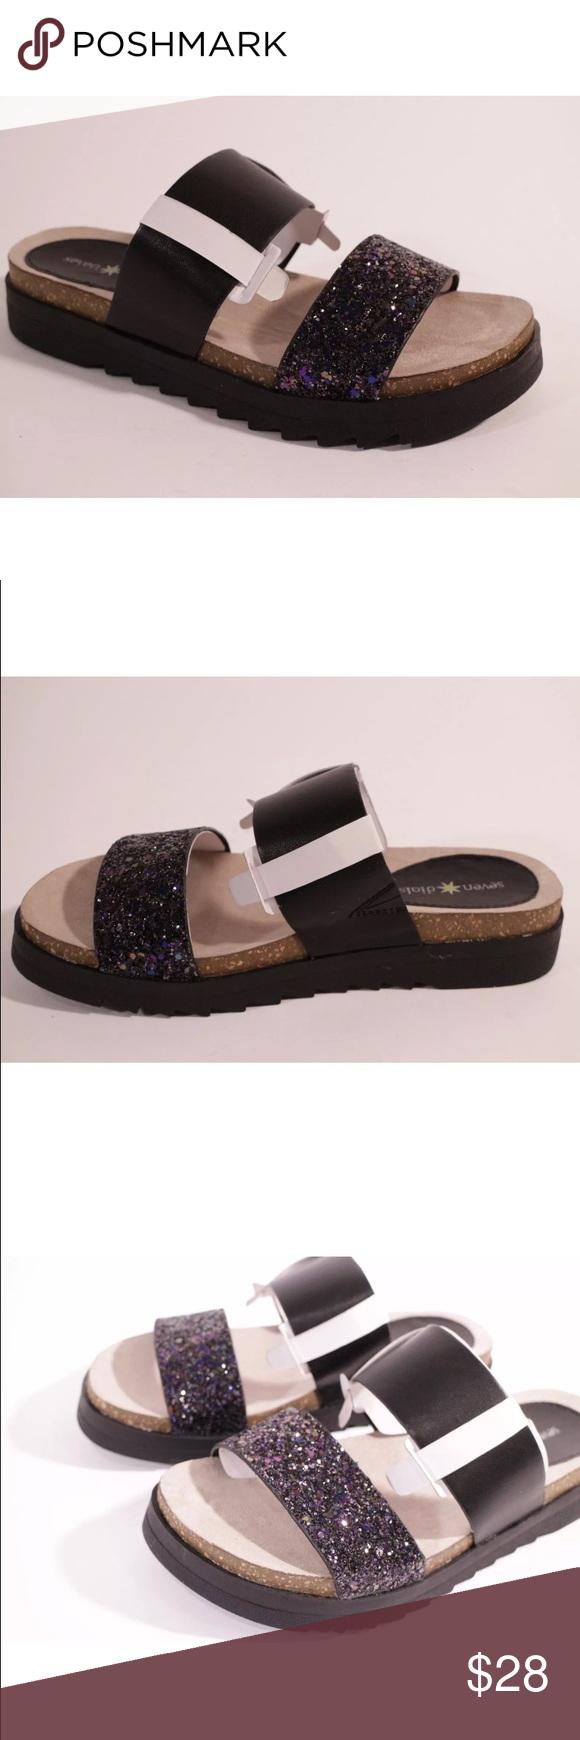 Brand new seven dials sparkly slide sandals Seven dials brand new slide sandals. Seven Dials Shoes Sandals